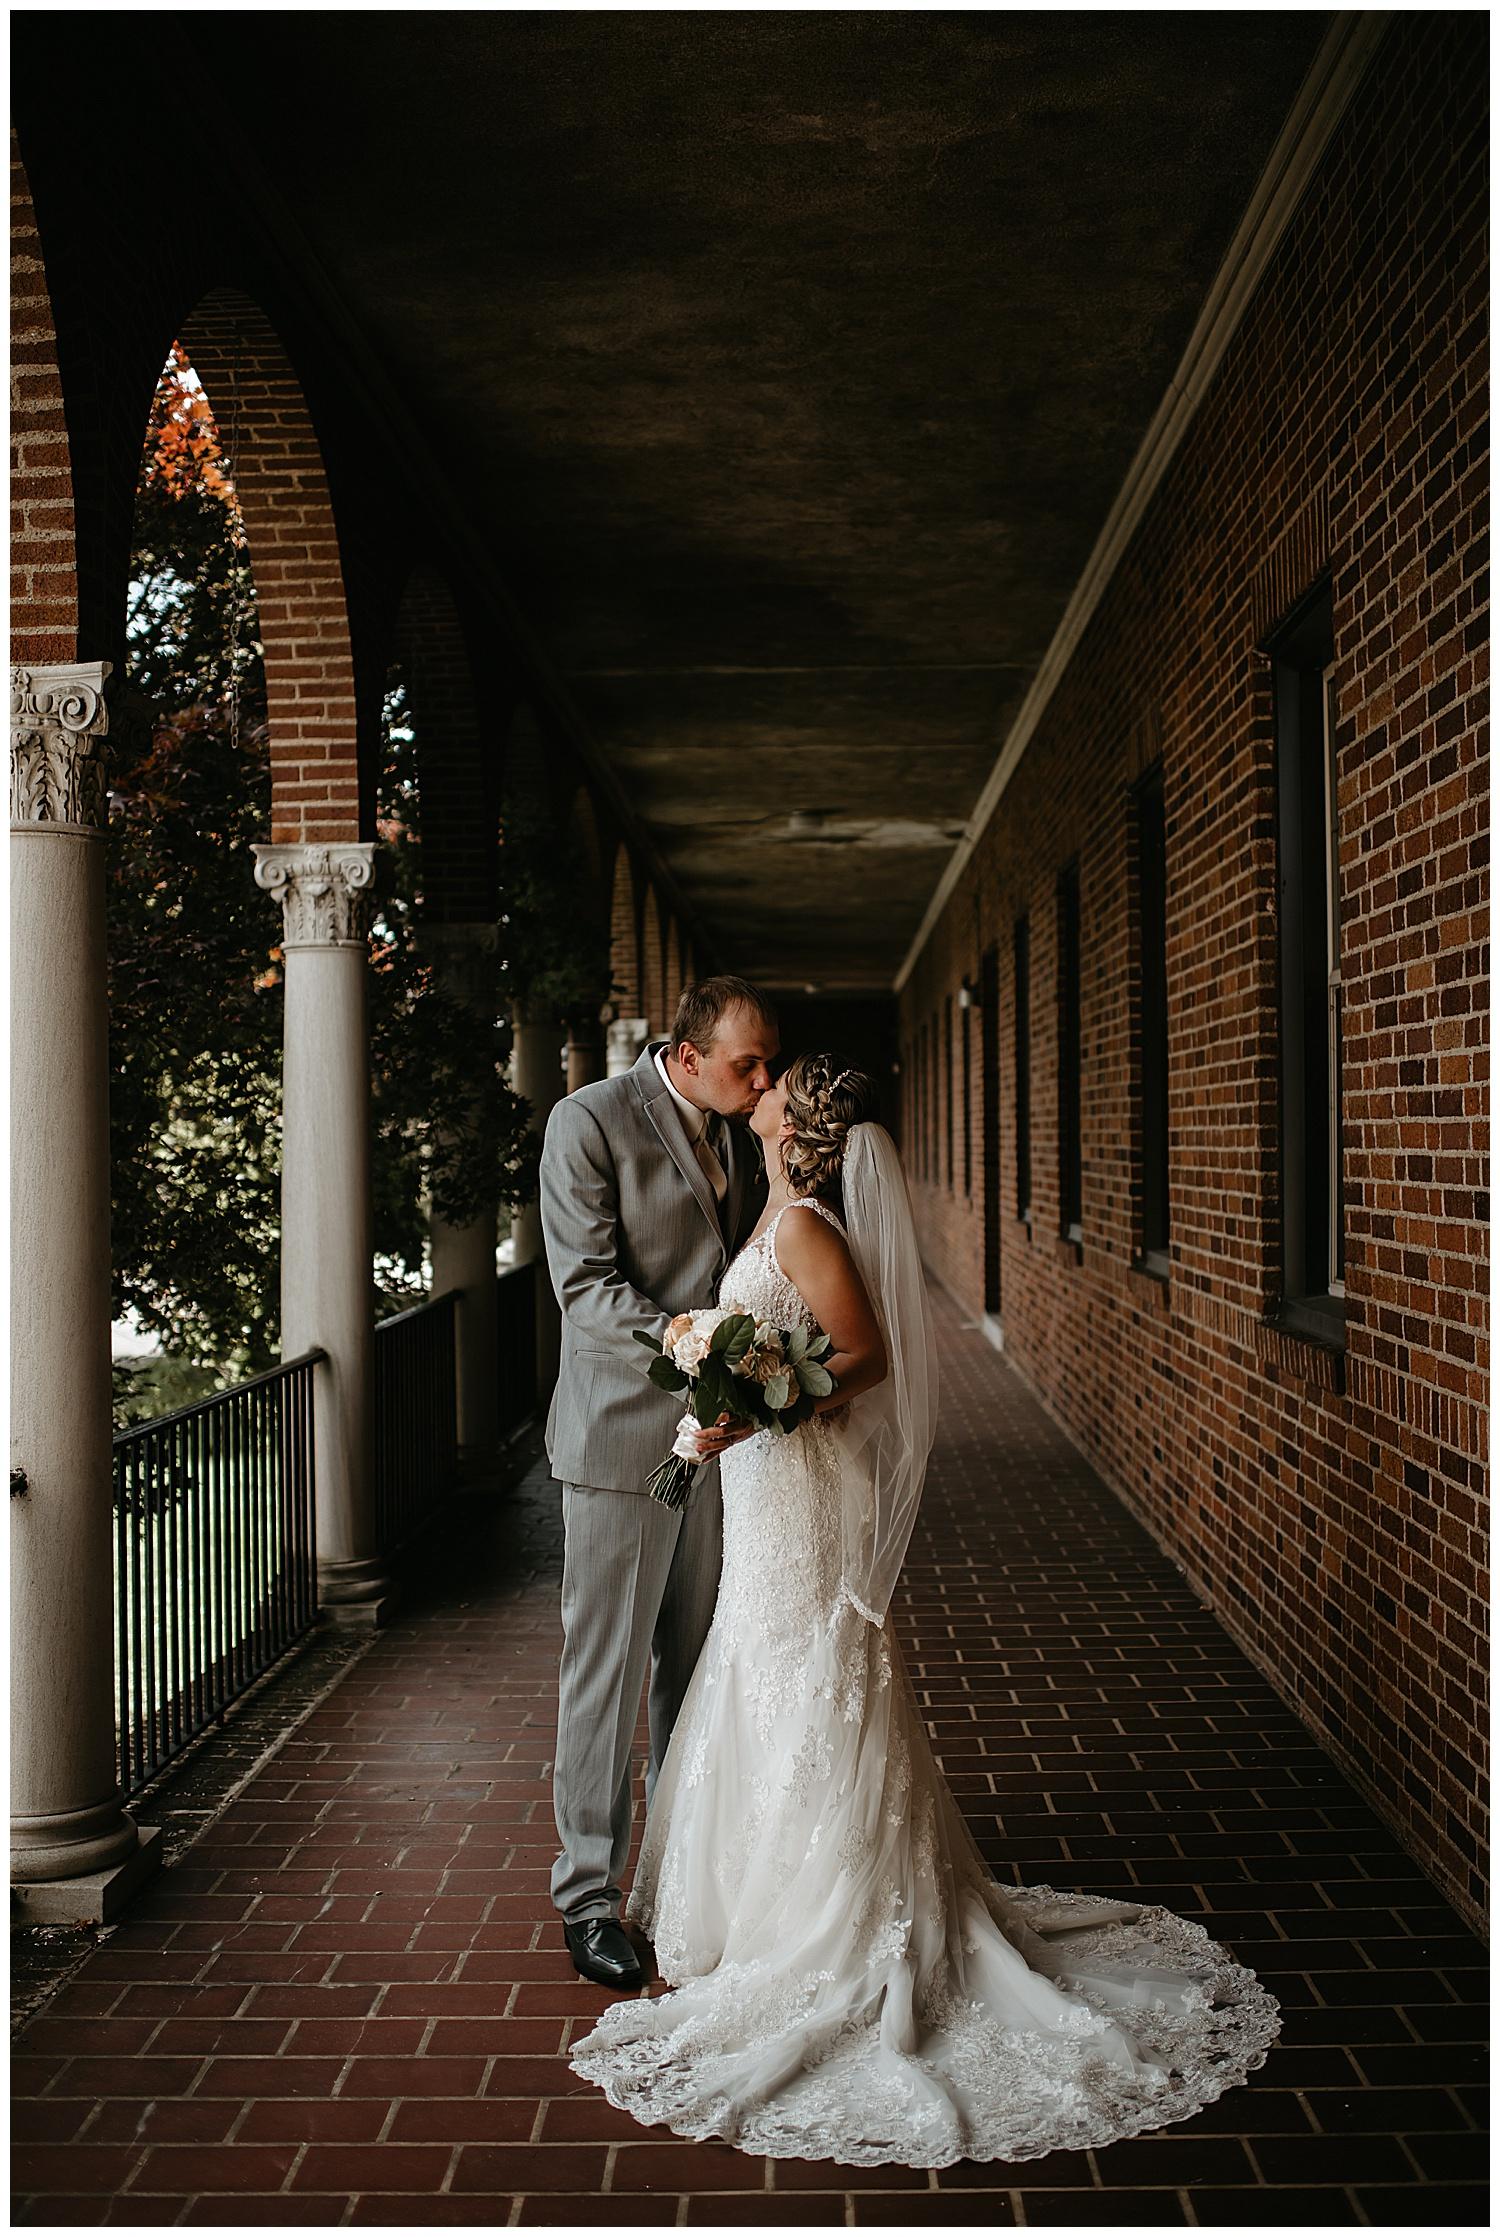 NEPA-Lehigh-Valley-Wedding-Photographer-at-Fountain-Springs-Country-Inn-Ashland-PA_0051.jpg